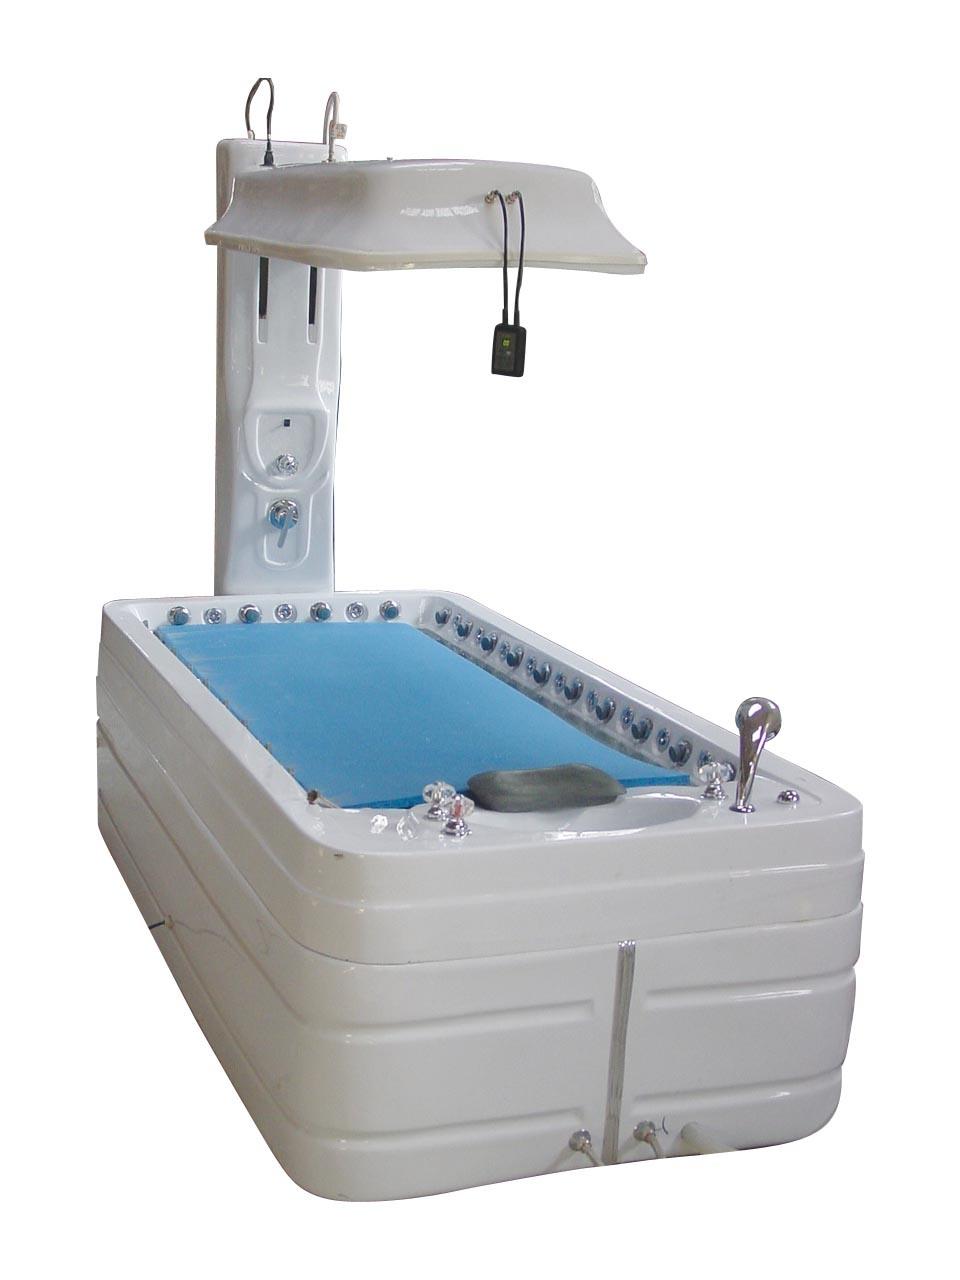 Hydraulic Massage Bed : China hydraulic massage bed d b spa product